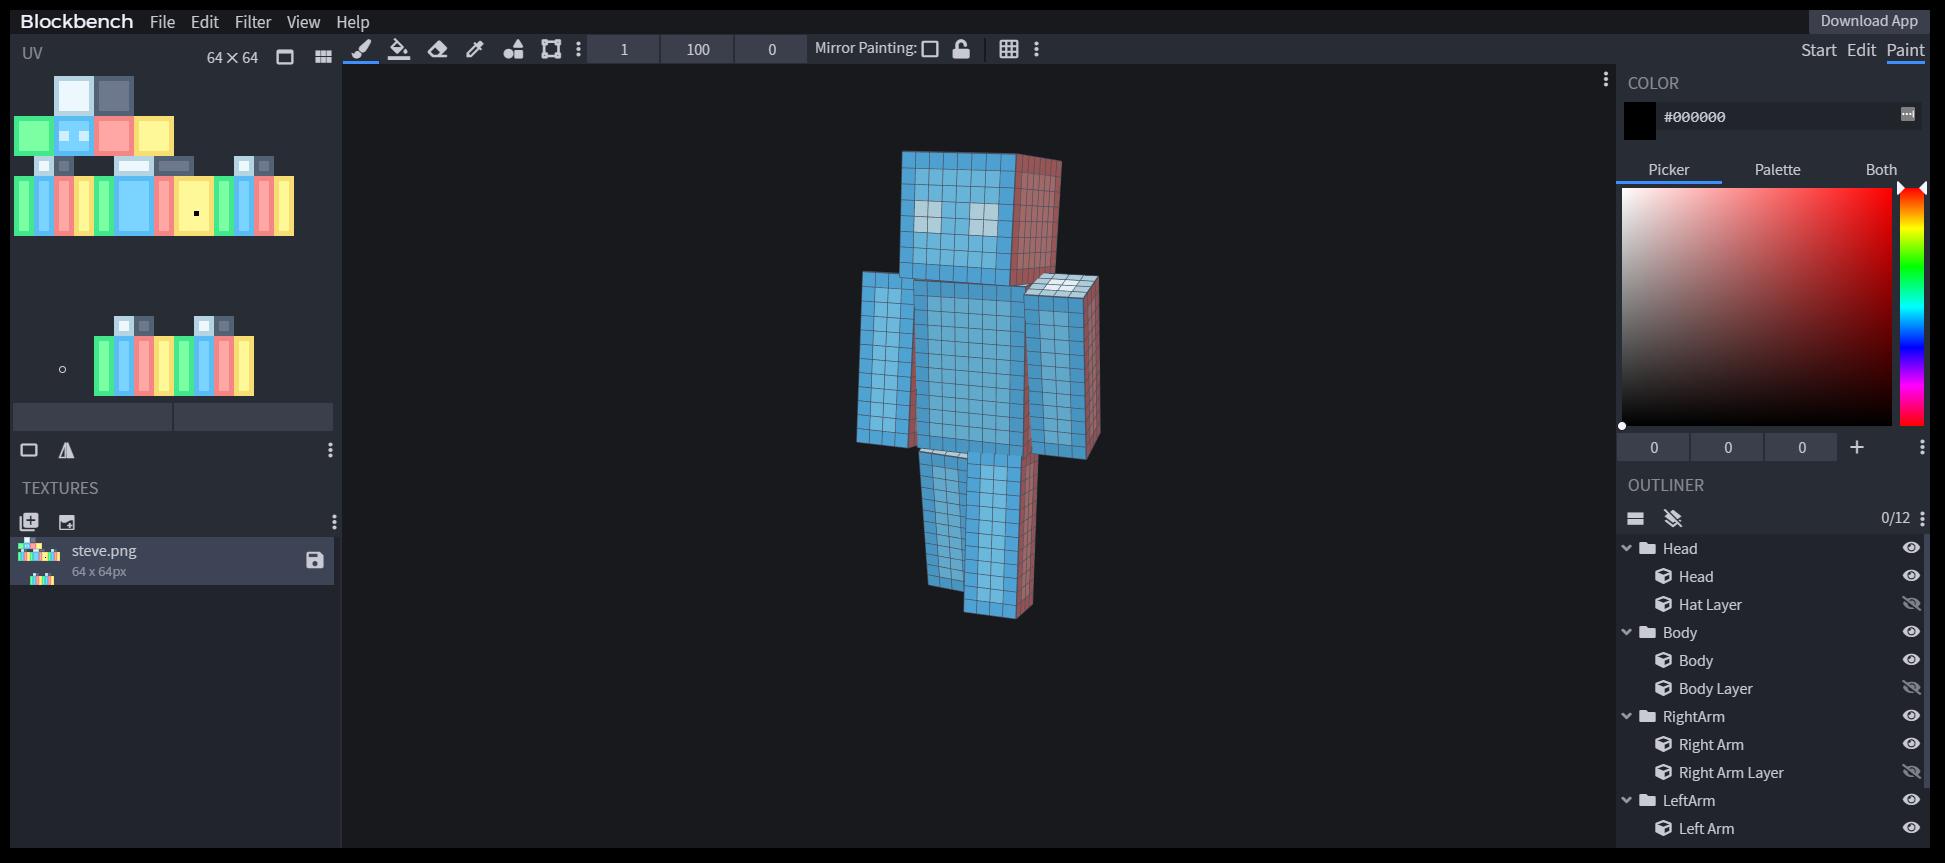 Minecraft Education Edition – Create your own Skins  @cdsmythe